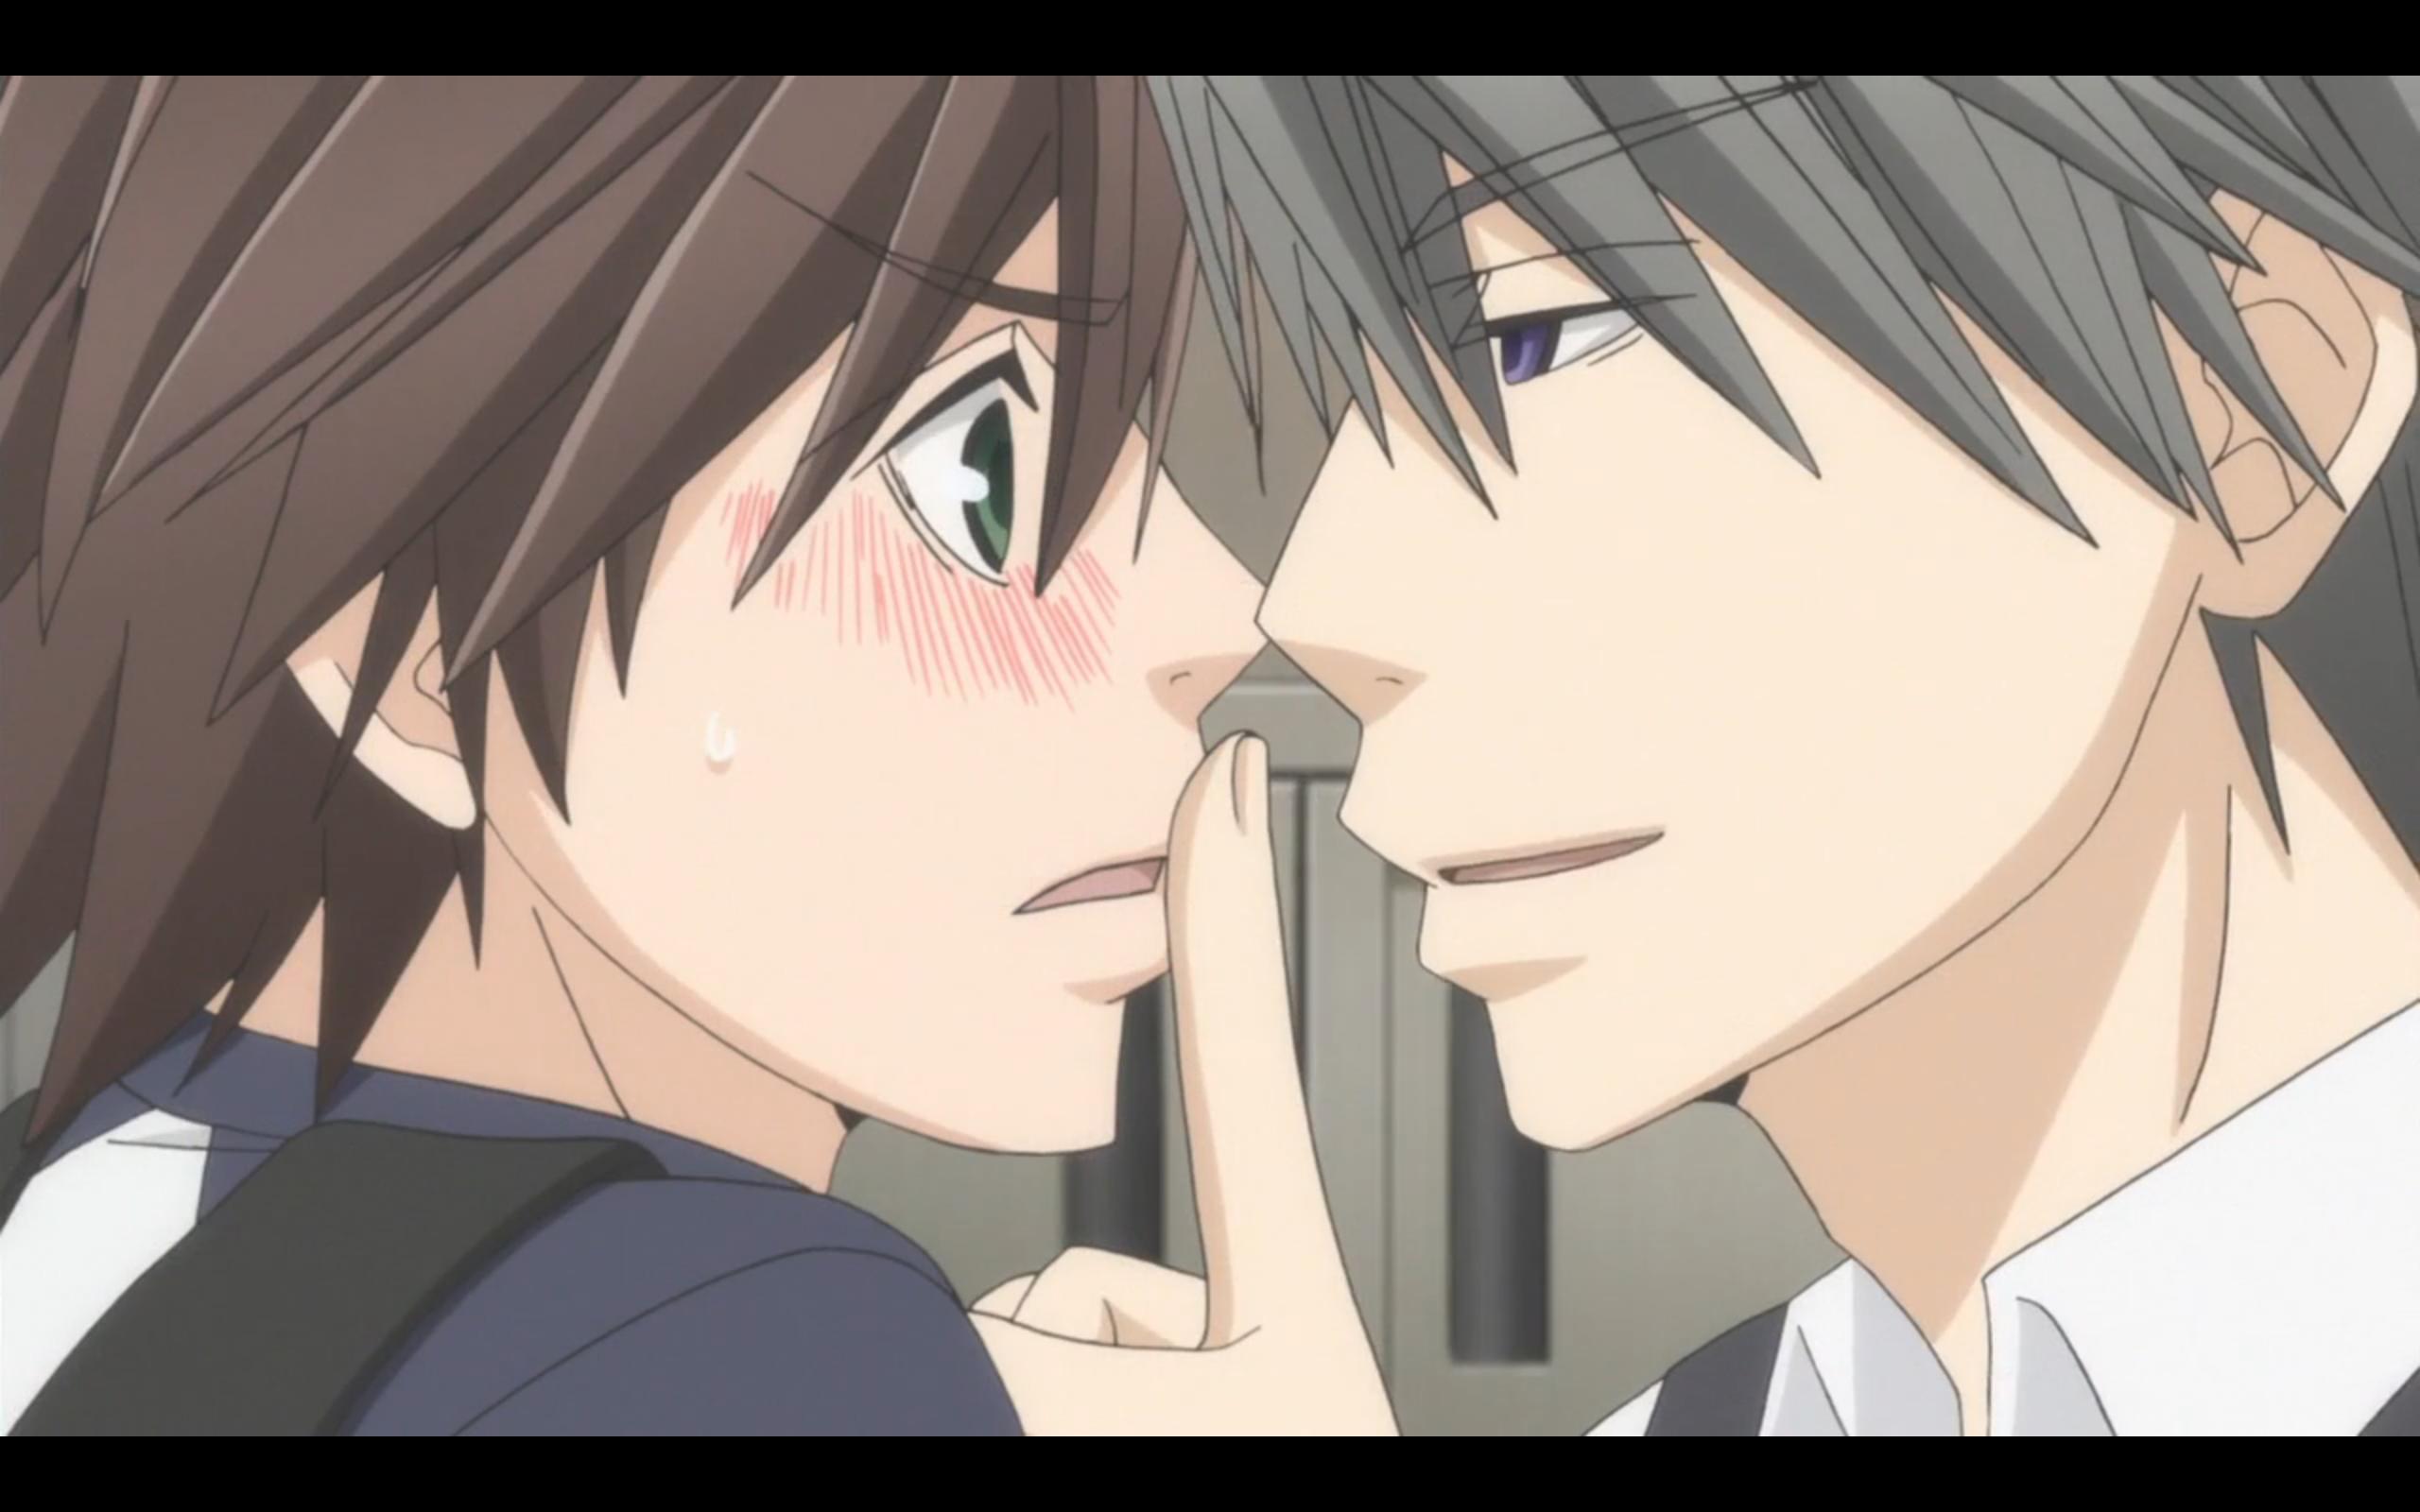 Misaki x Usagi~Junjou Romantica S03   Junjou romantica ...